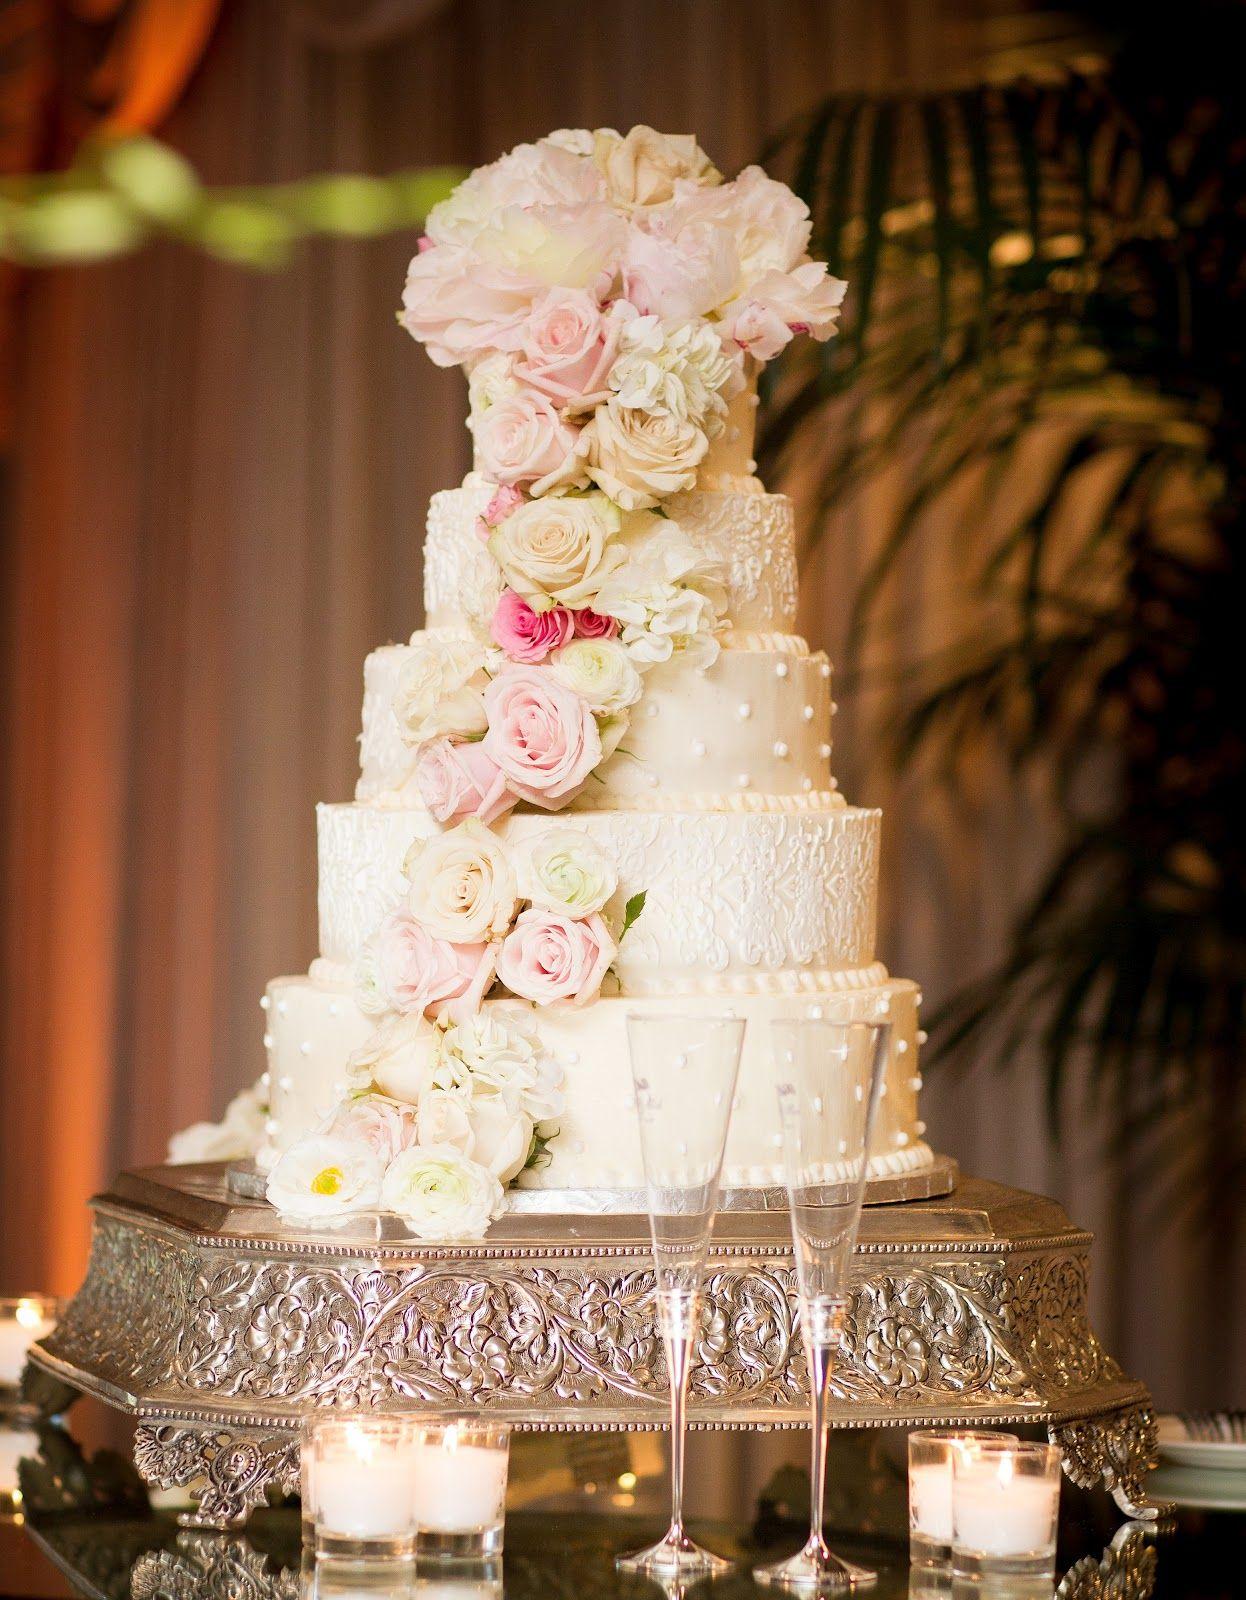 Flour u flower designs love and life pinterest flower designs